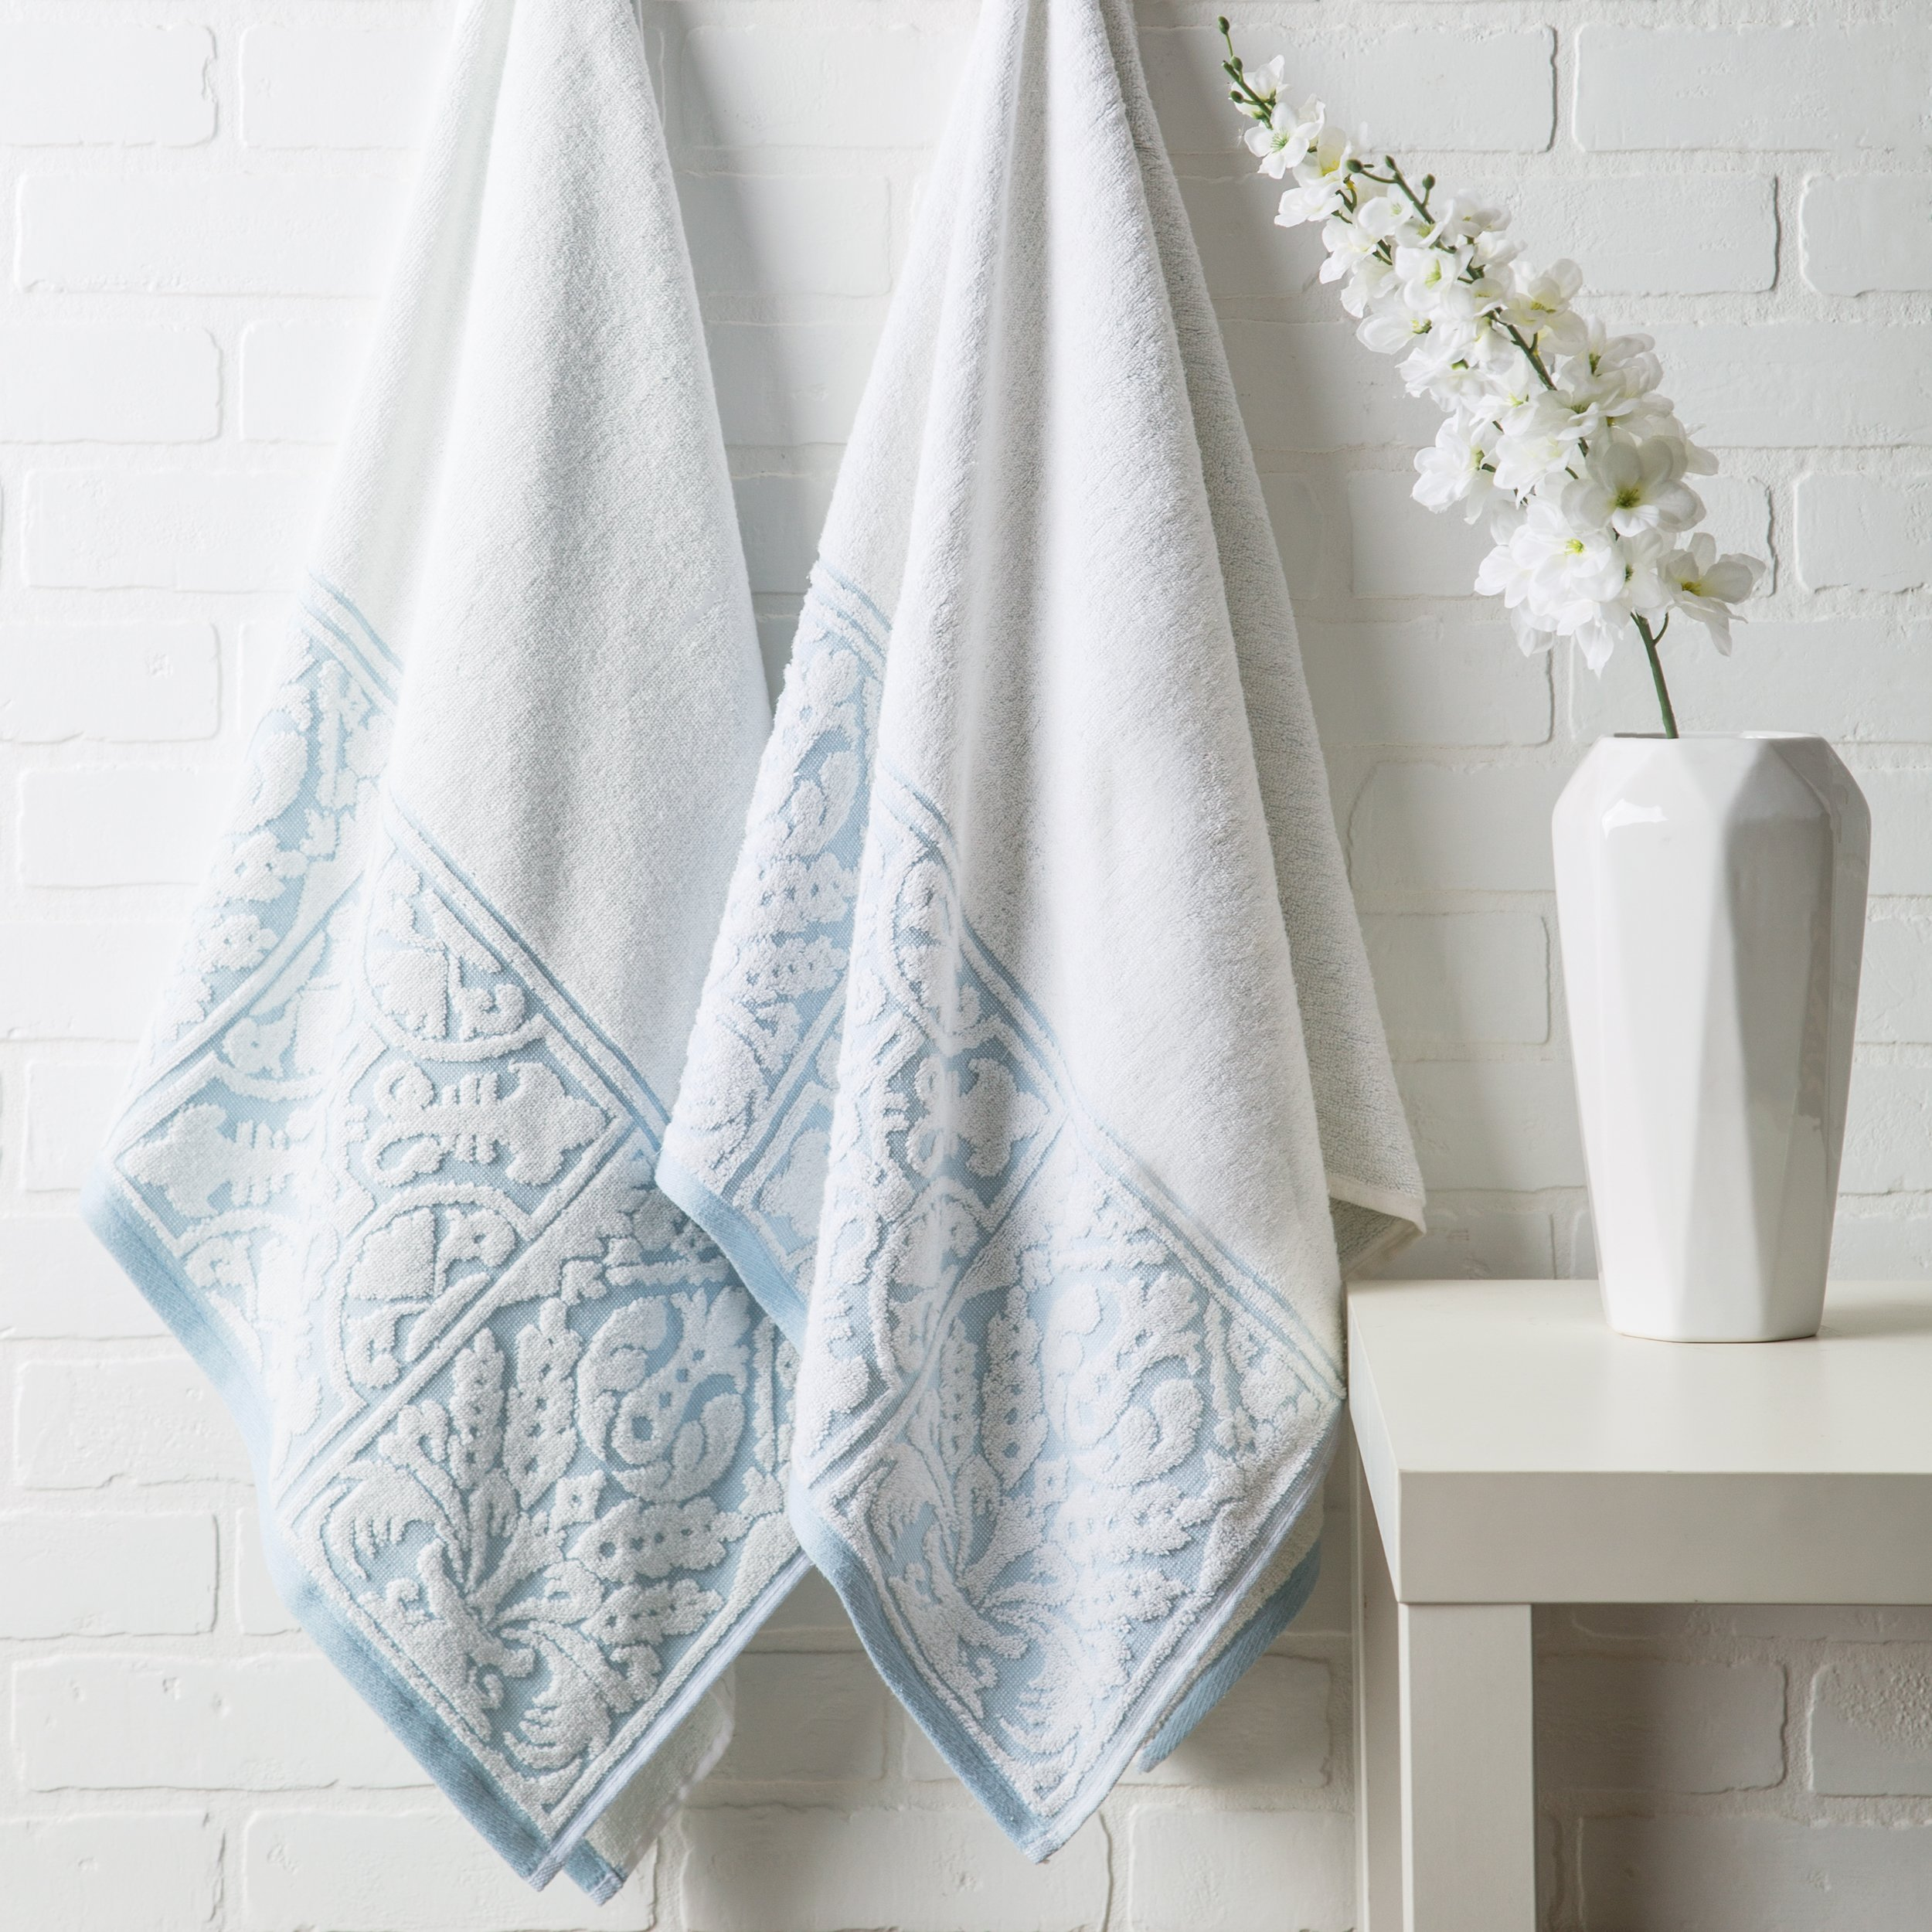 Luxor Linens - 100% Cotton 3 PC Absorbent Jacquard Towel Set, Hotel Luxury- 1 Bath Towel, 1 Hand Towel, 1 Wash Cloth - White/Aquamarine